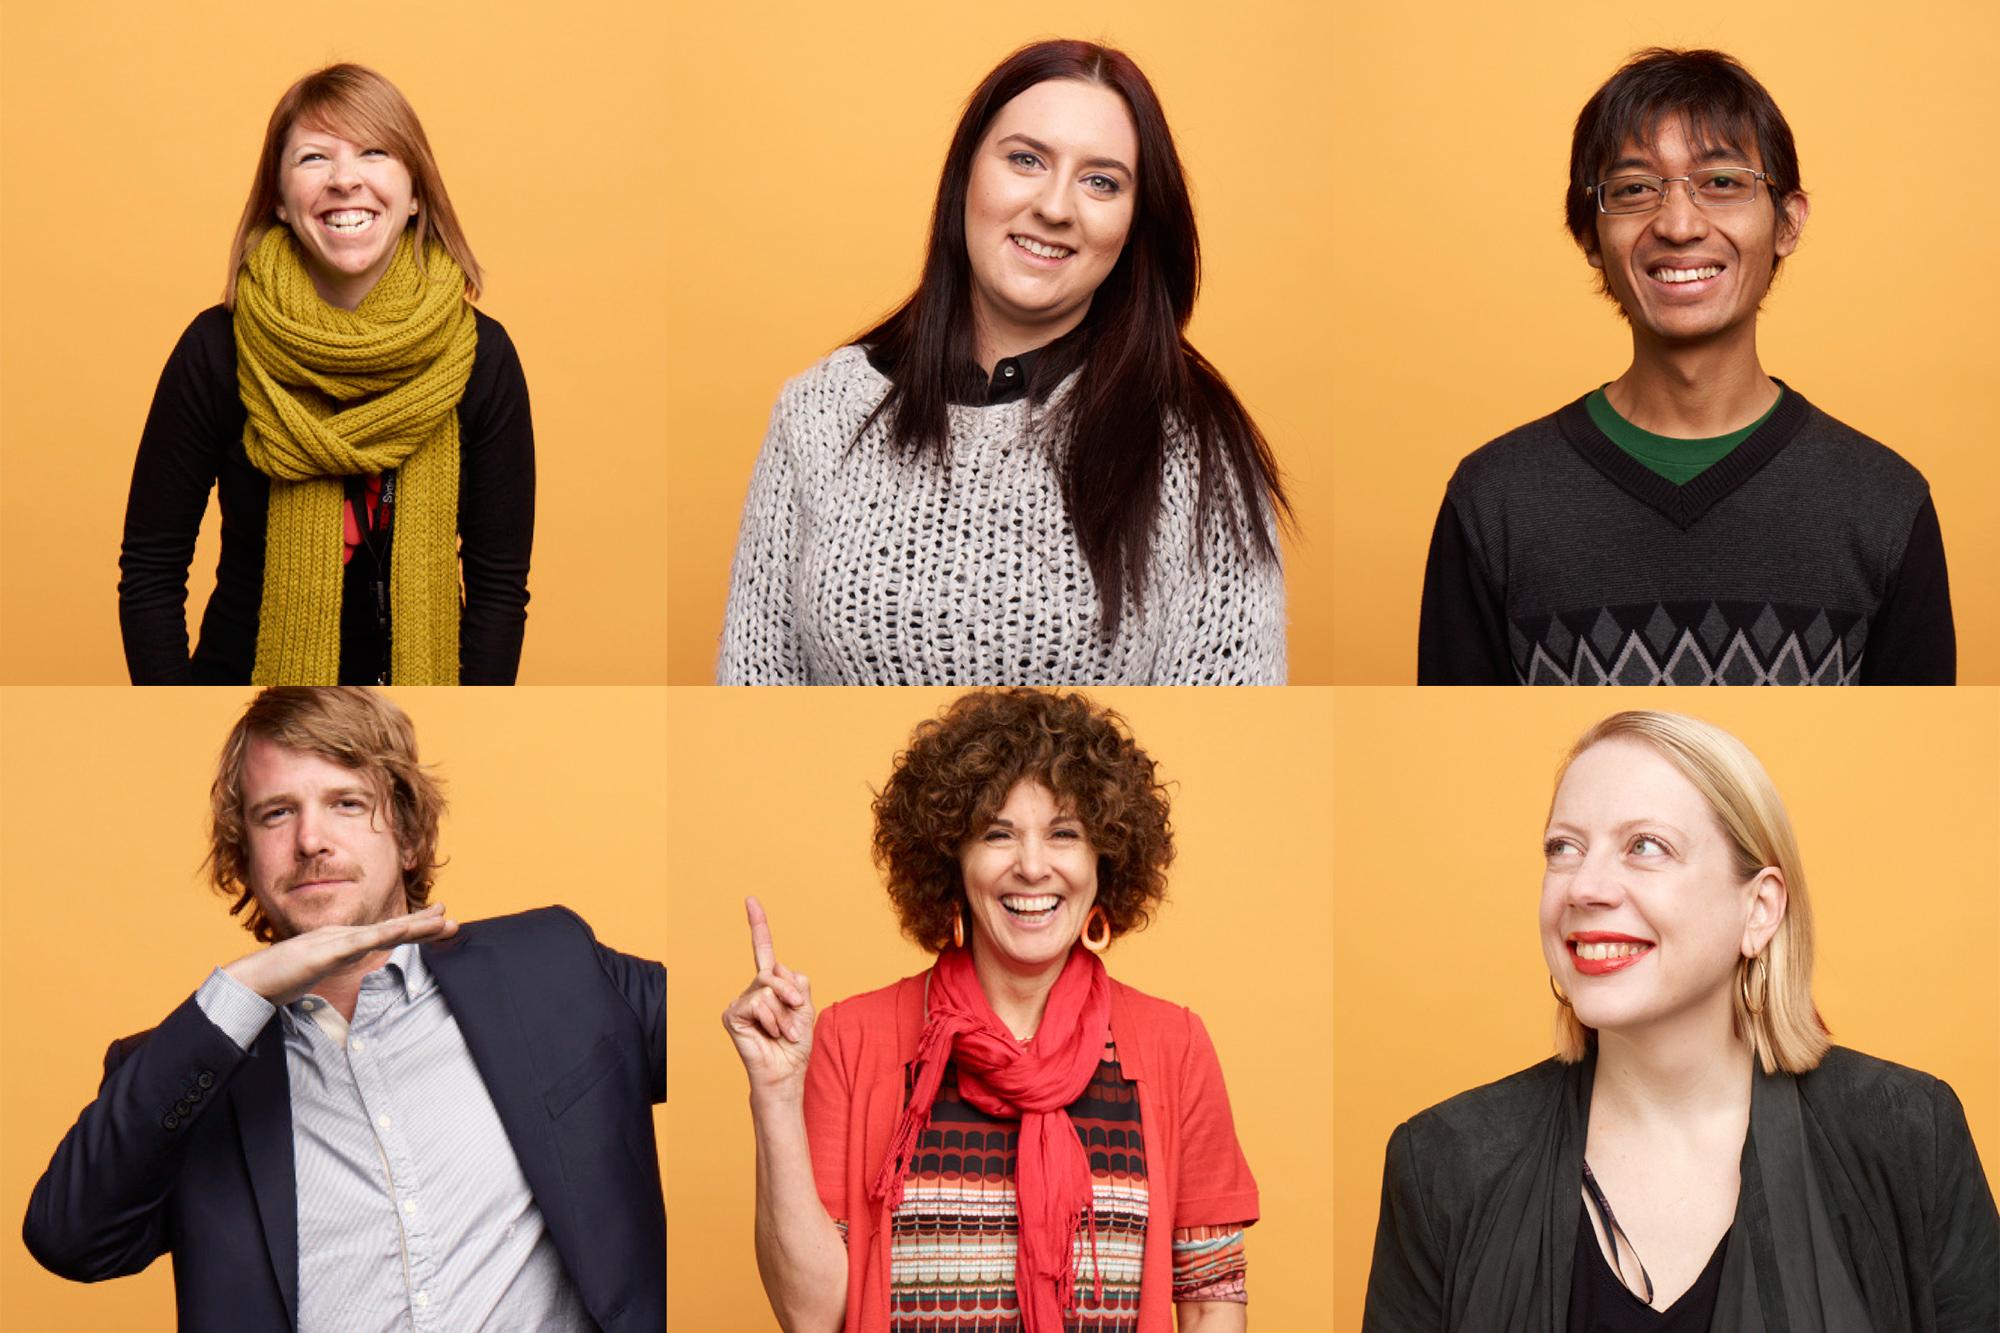 ReAgency_AustraliaUnlimited_TEDX_Portraits_Digital_03.jpg